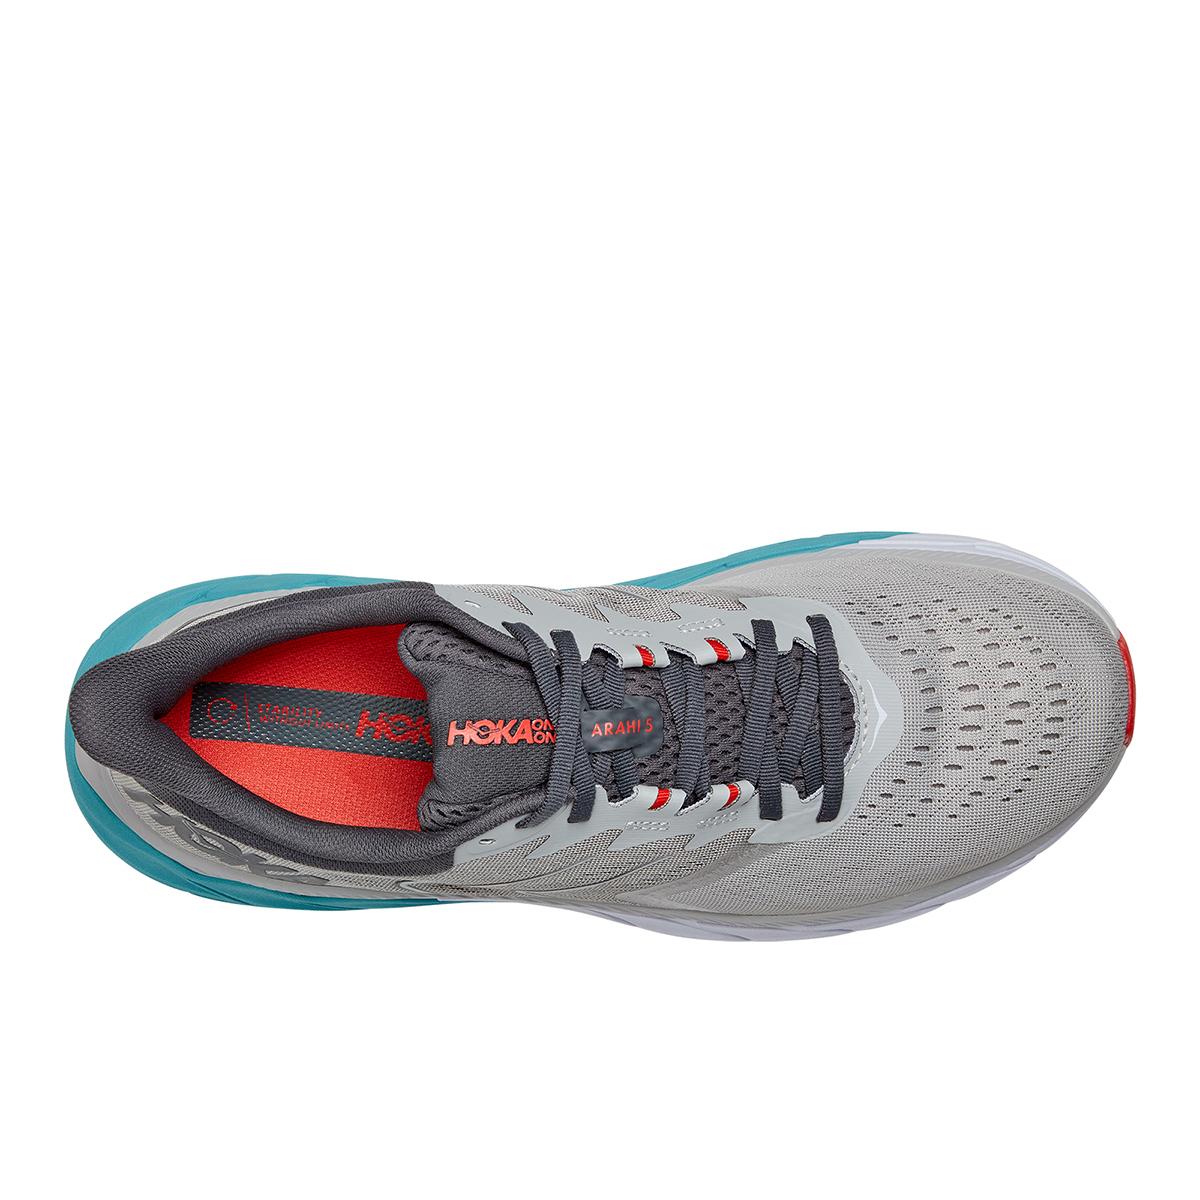 Men's Hoka One One Arahi 5 Running Shoe - Color: Harbor Mist / Aquarelle - Size: 7 - Width: Regular, Harbor Mist / Aquarelle, large, image 3